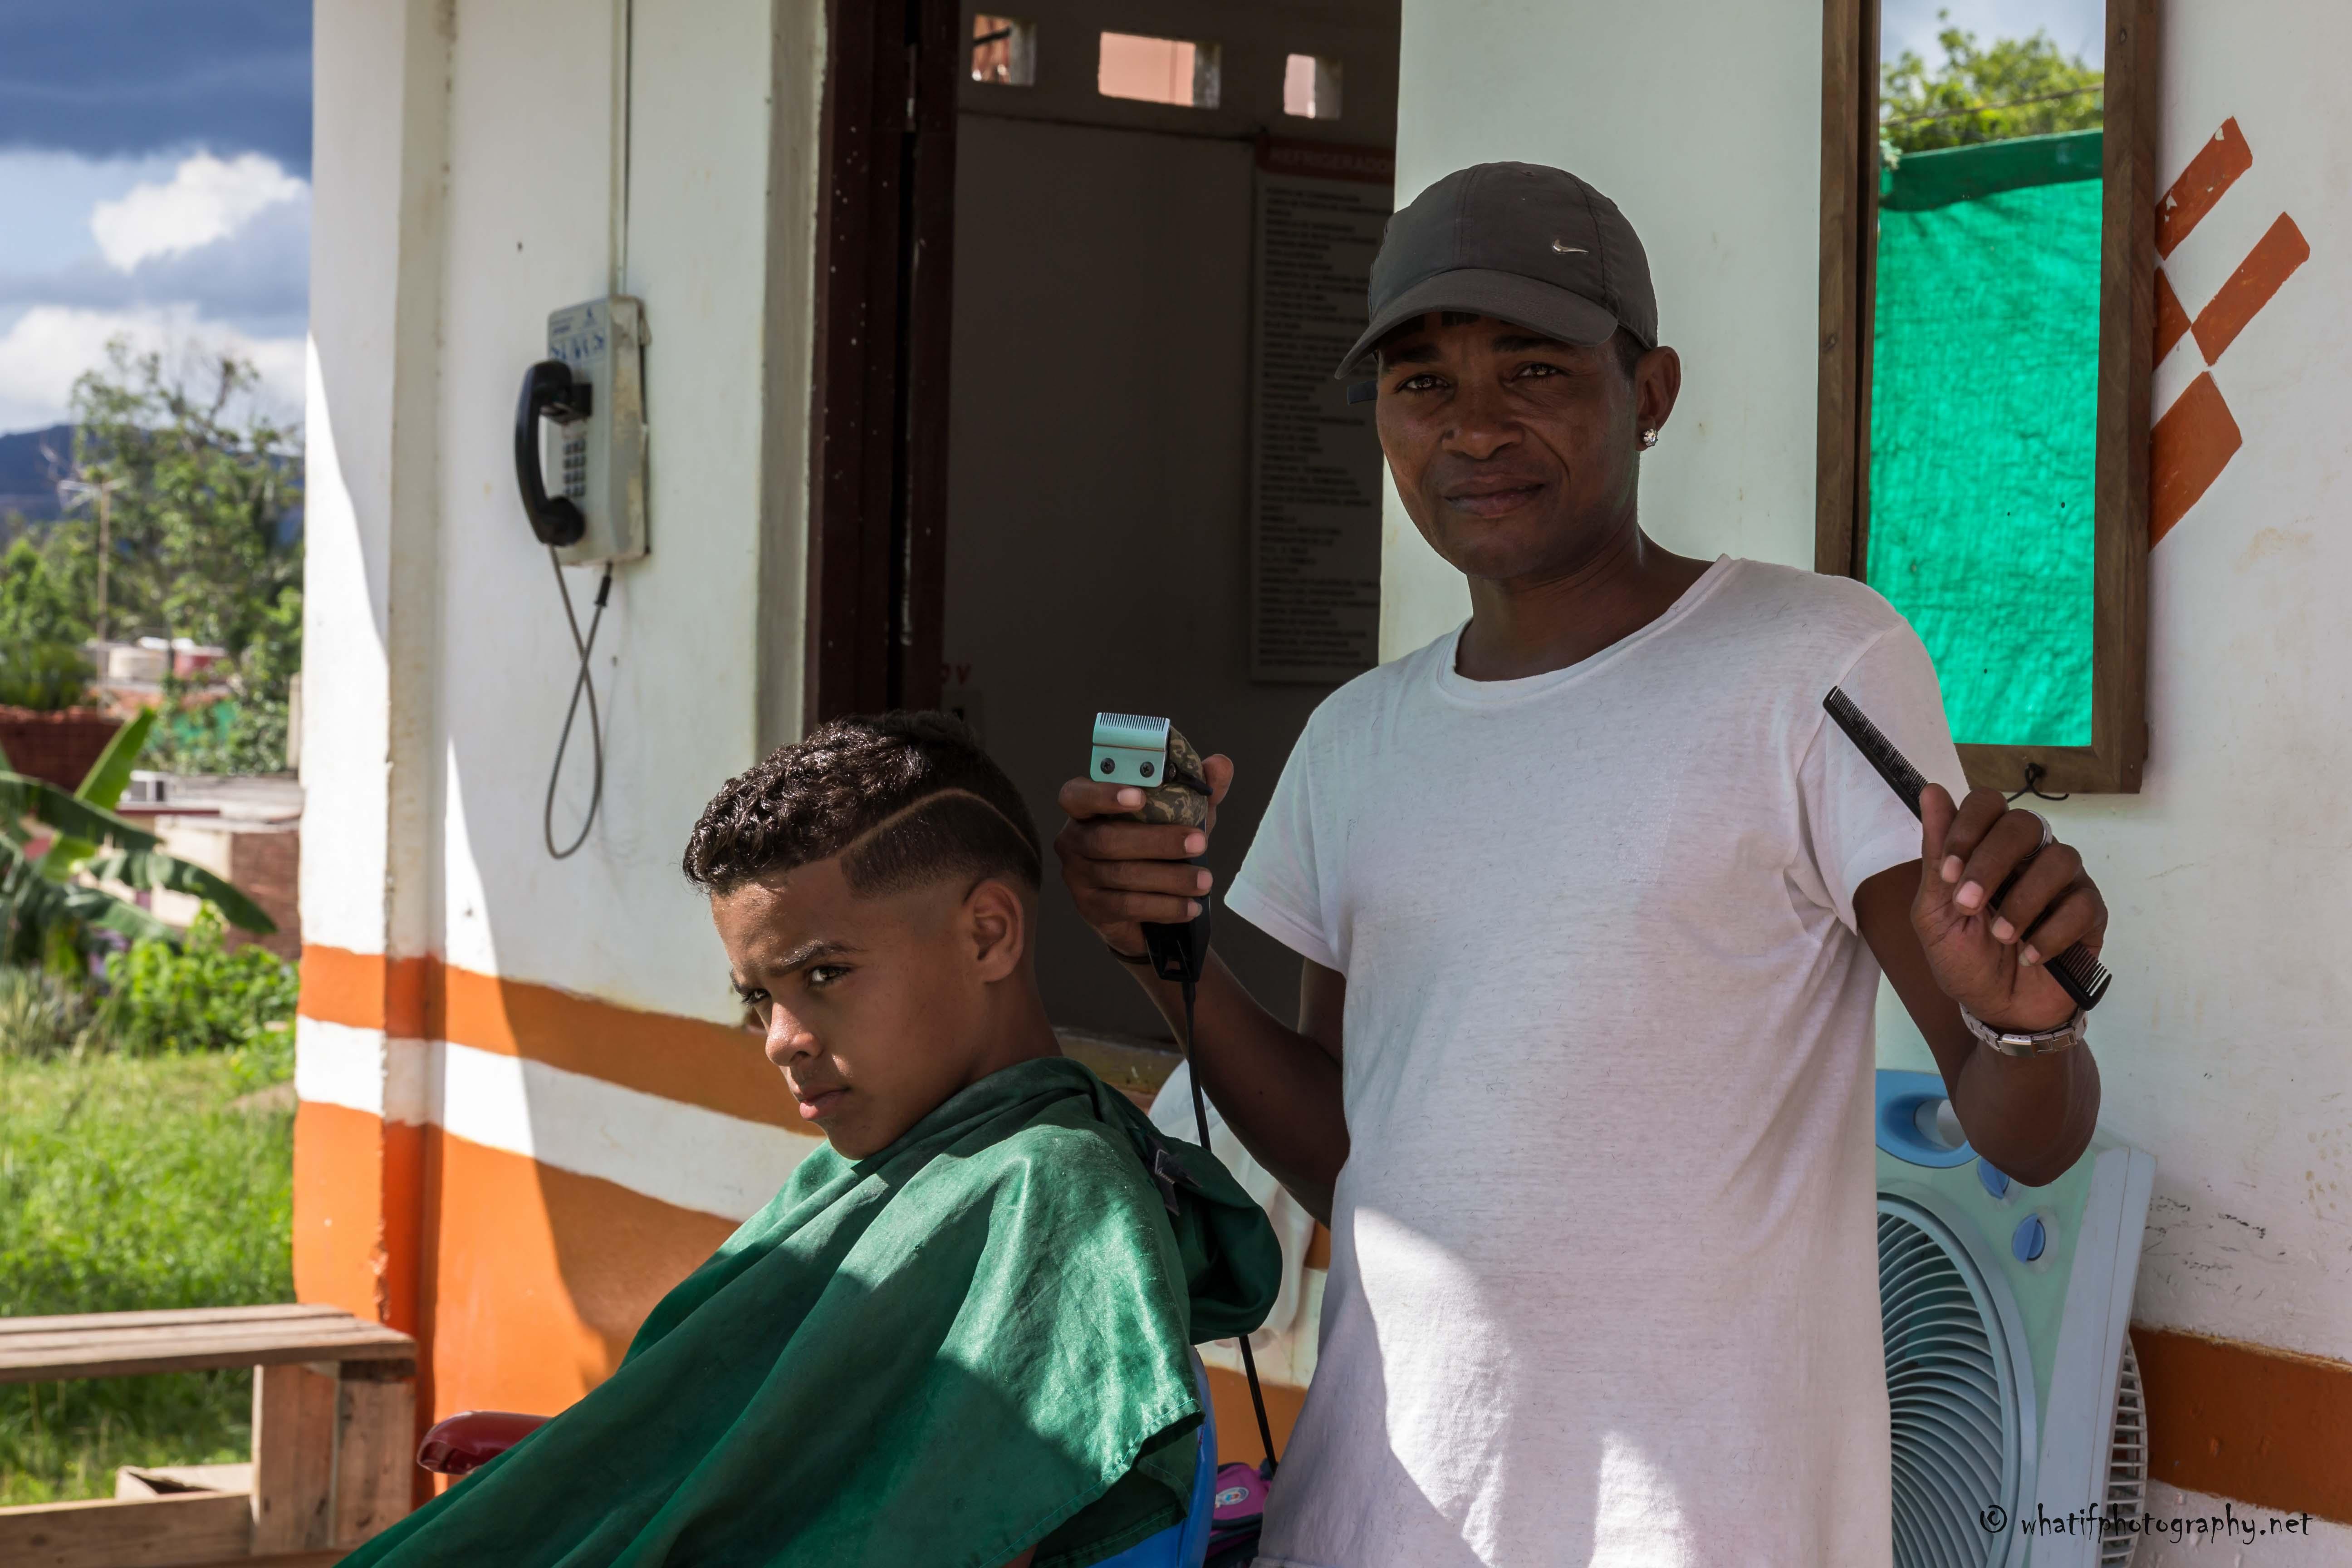 Hairdresser from Vinales